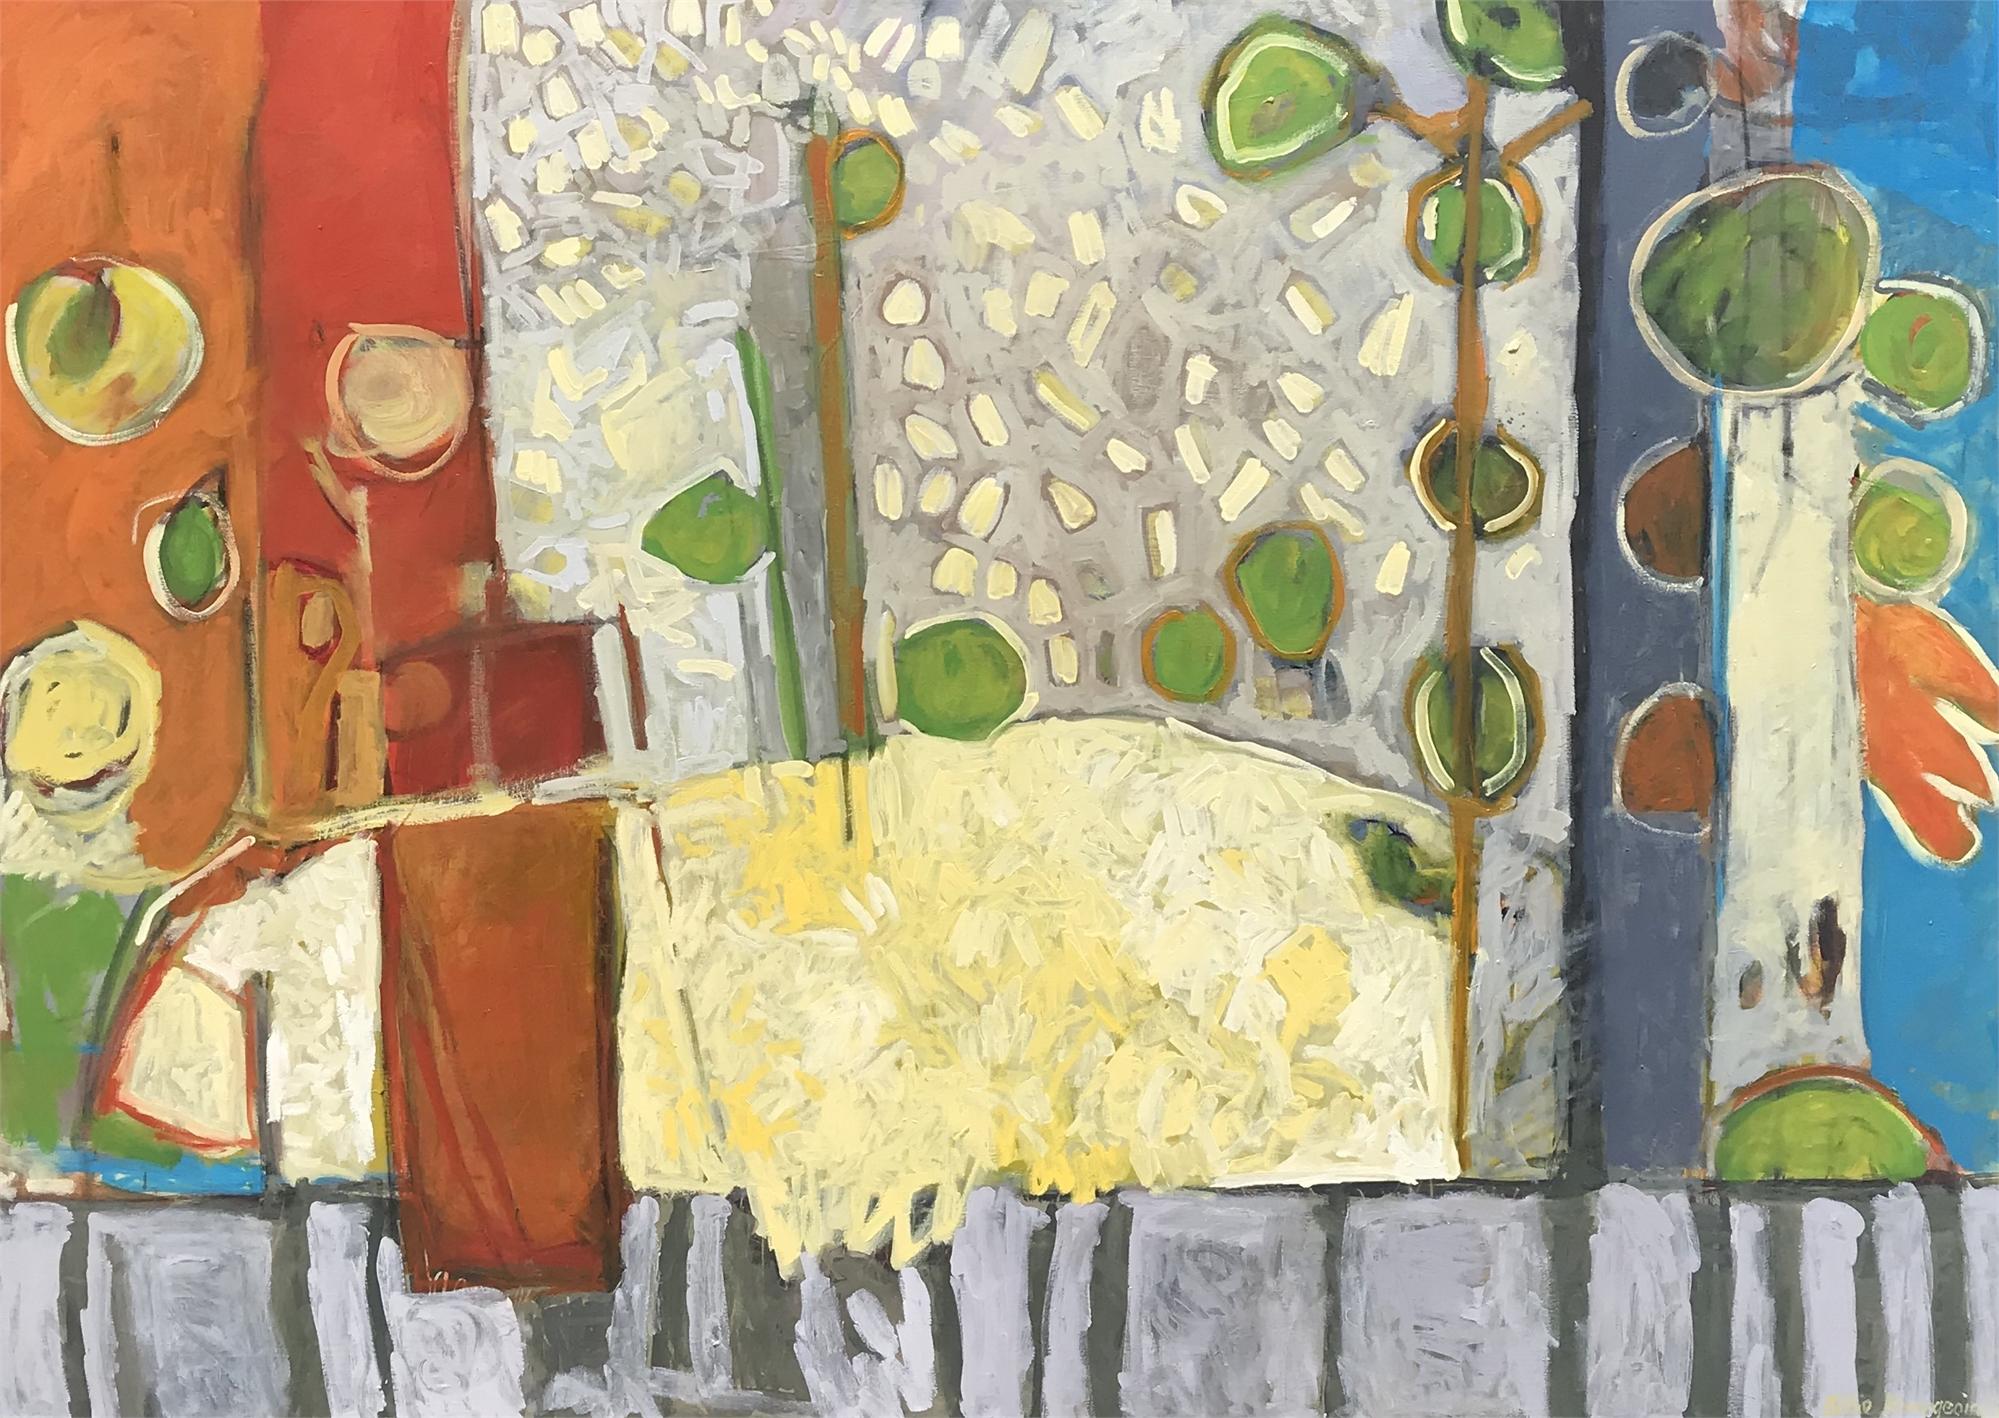 Peas on Polls by Billie Bourgeois